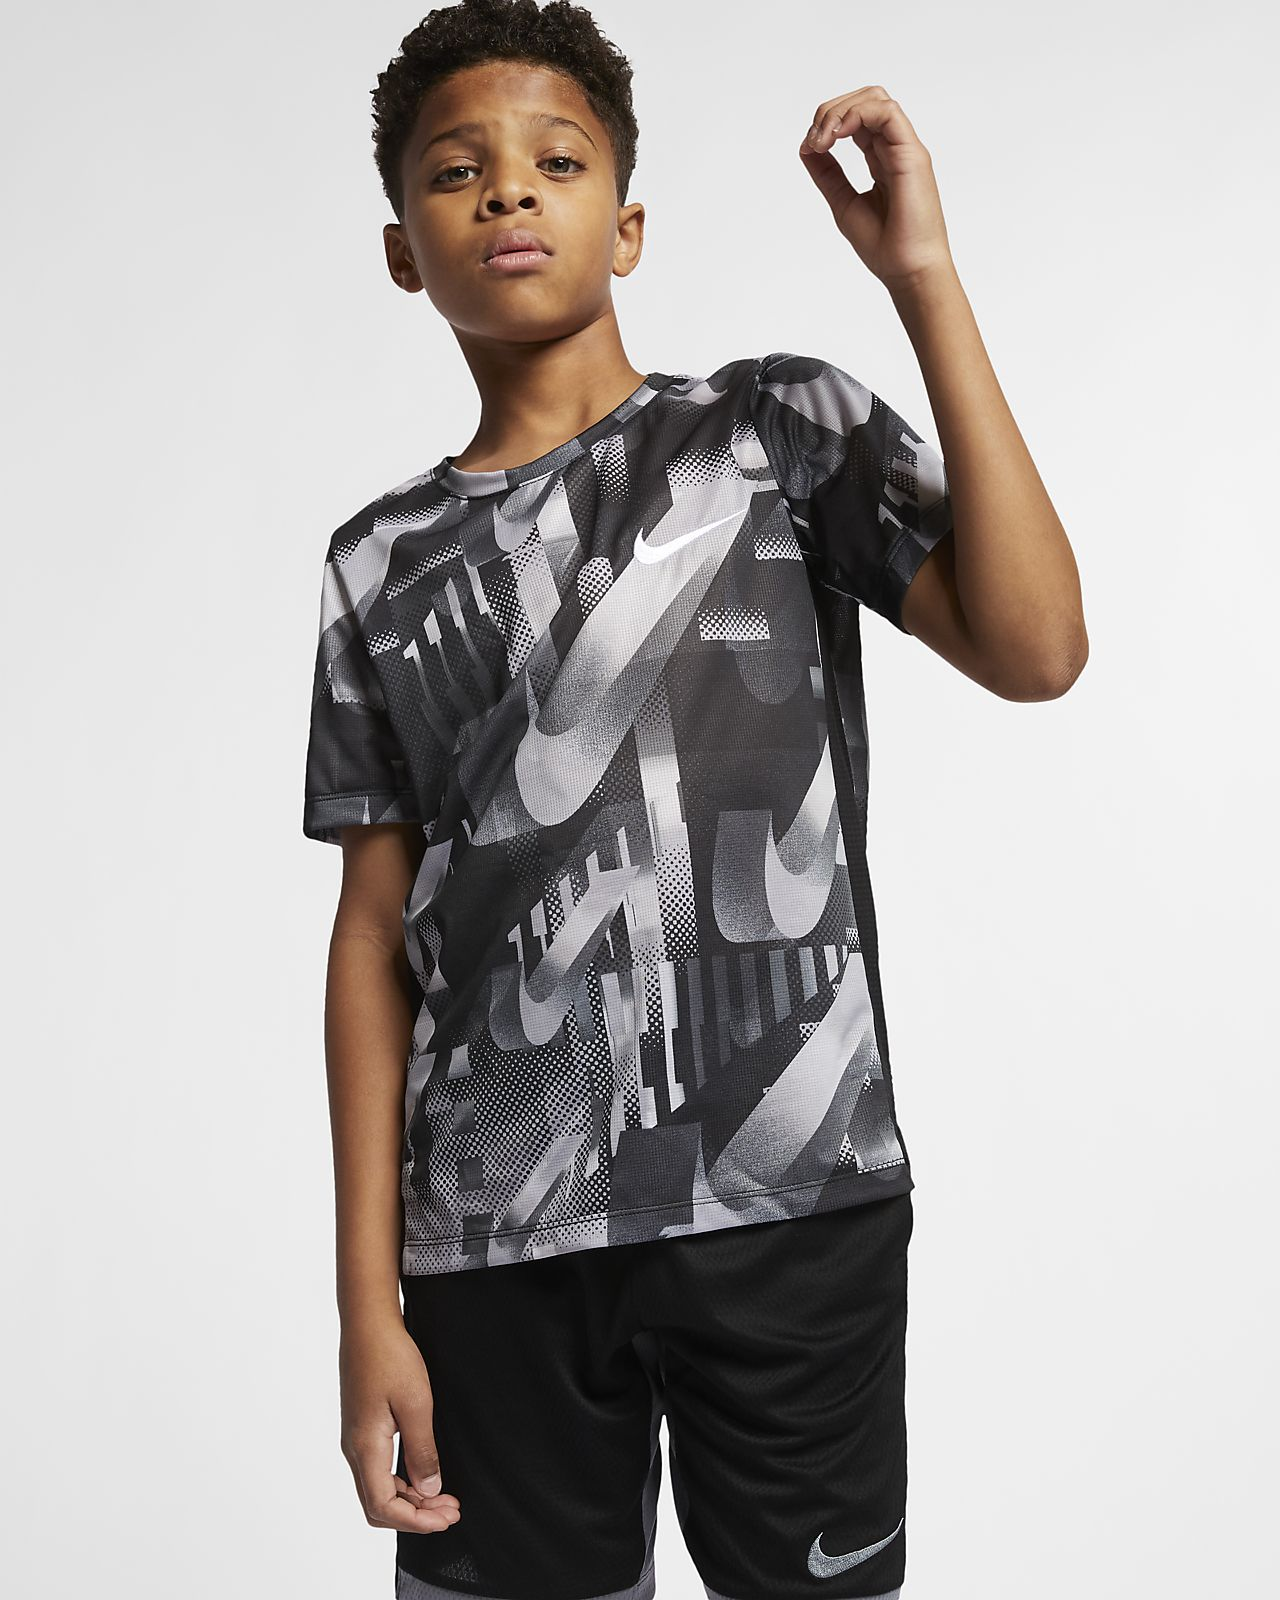 Nike Dri-FIT Older Kids' (Boys') Short-Sleeve Printed Training Top